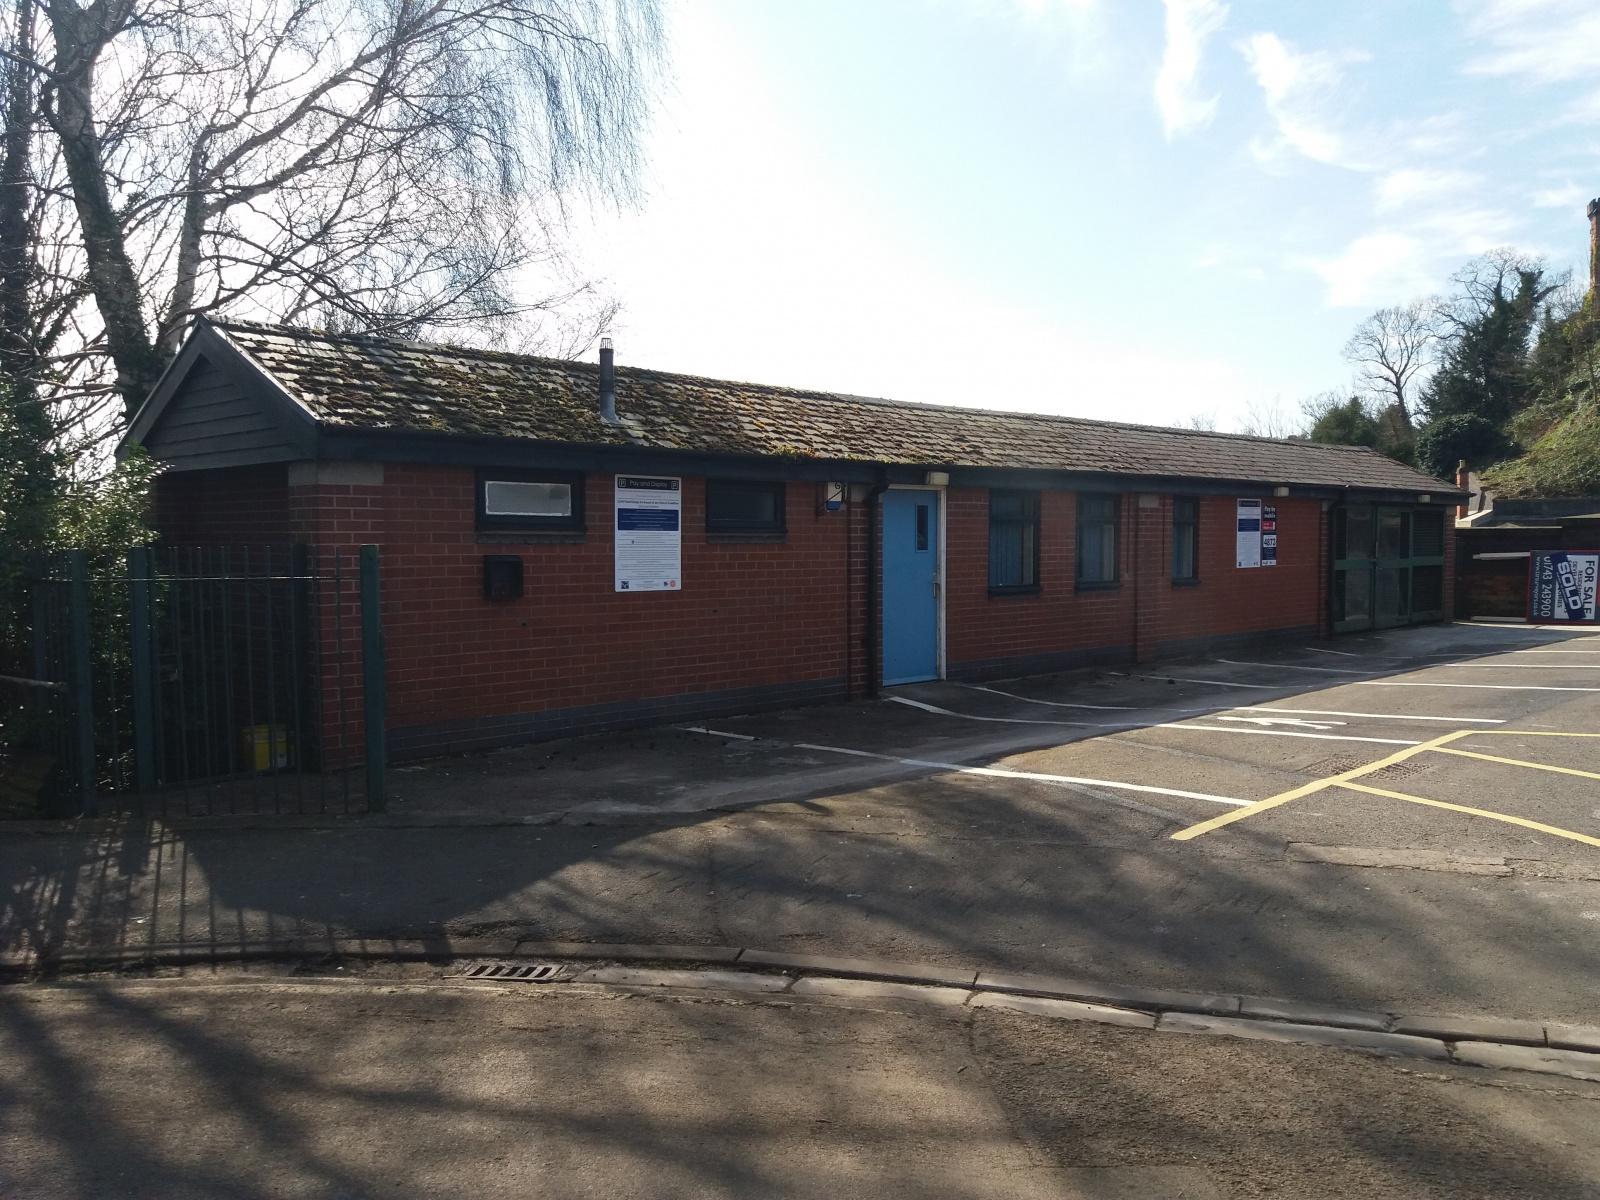 Office & Storage Building, Howard Street, Shrewsbury, Shropshire